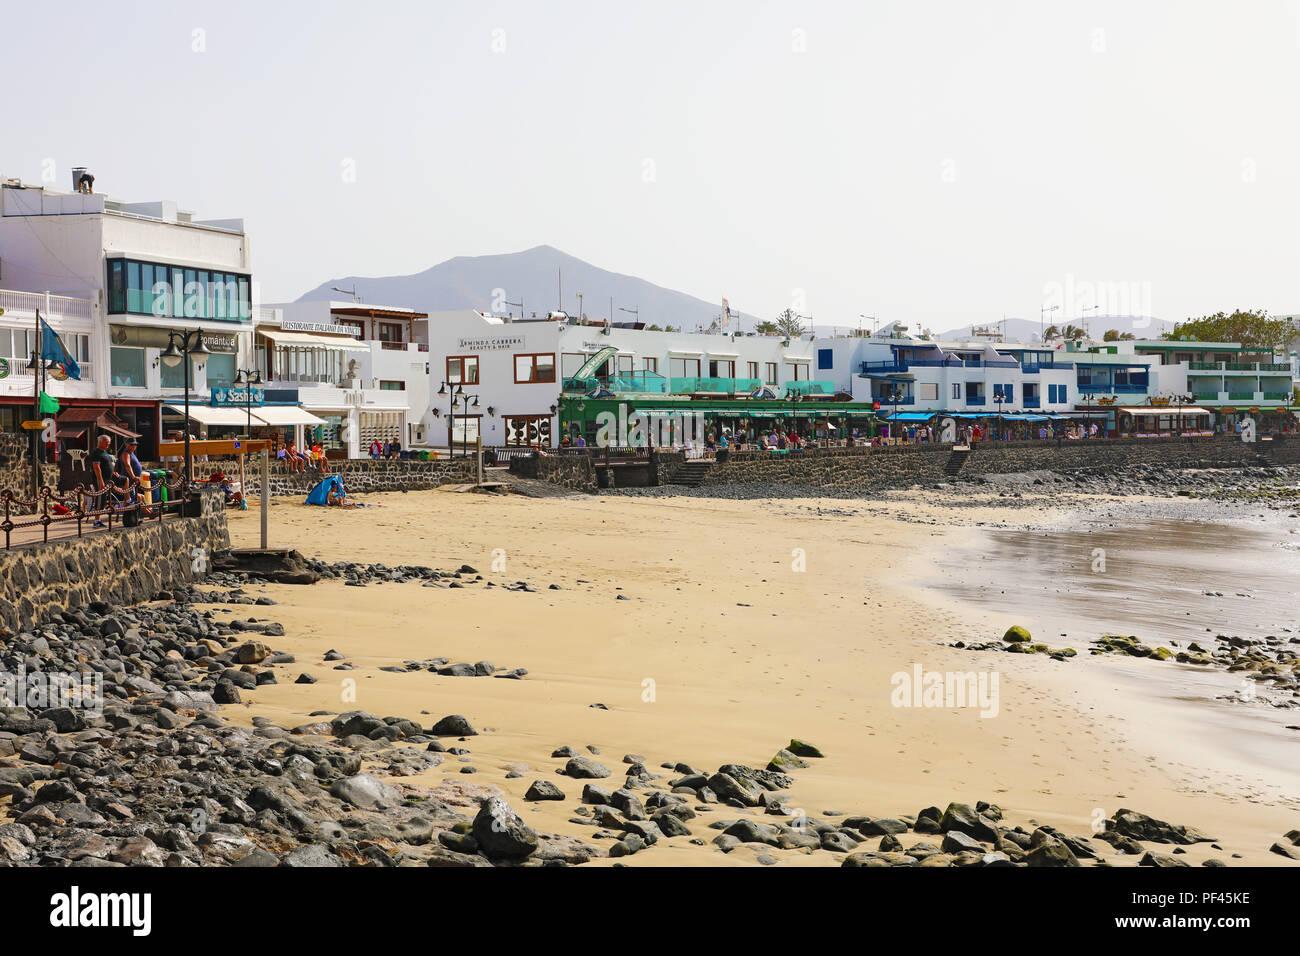 LANZAROTE, SPAIN - APRIL 18, 2018: Beautiful view of Playa Blanca beach and village, Lanzarote, Canary Islands, Spain Stock Photo